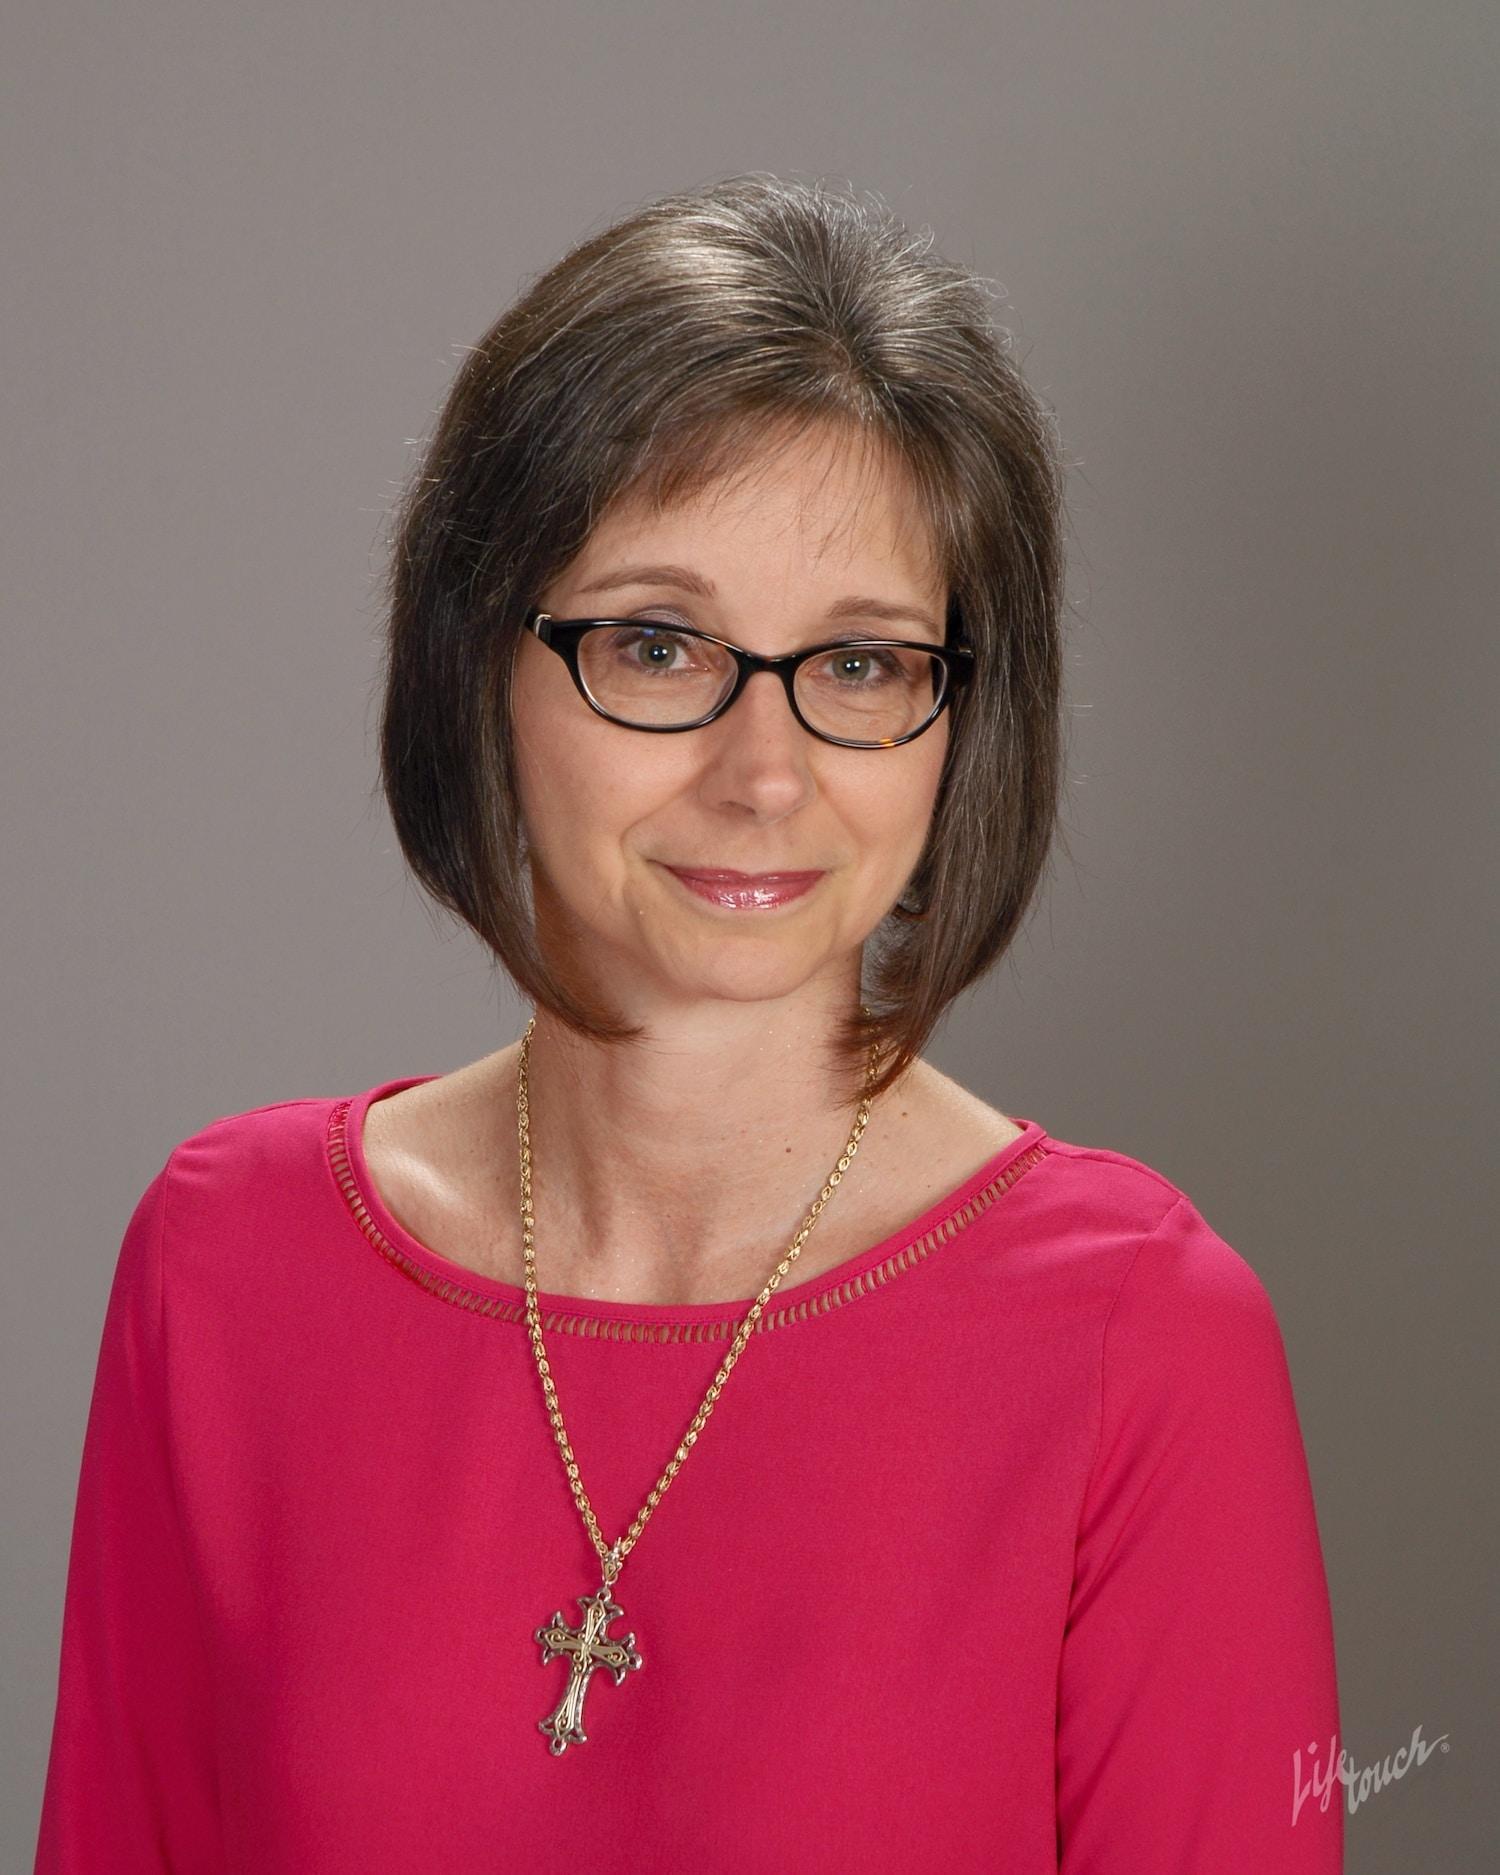 Go to Pamela Piquette's profile